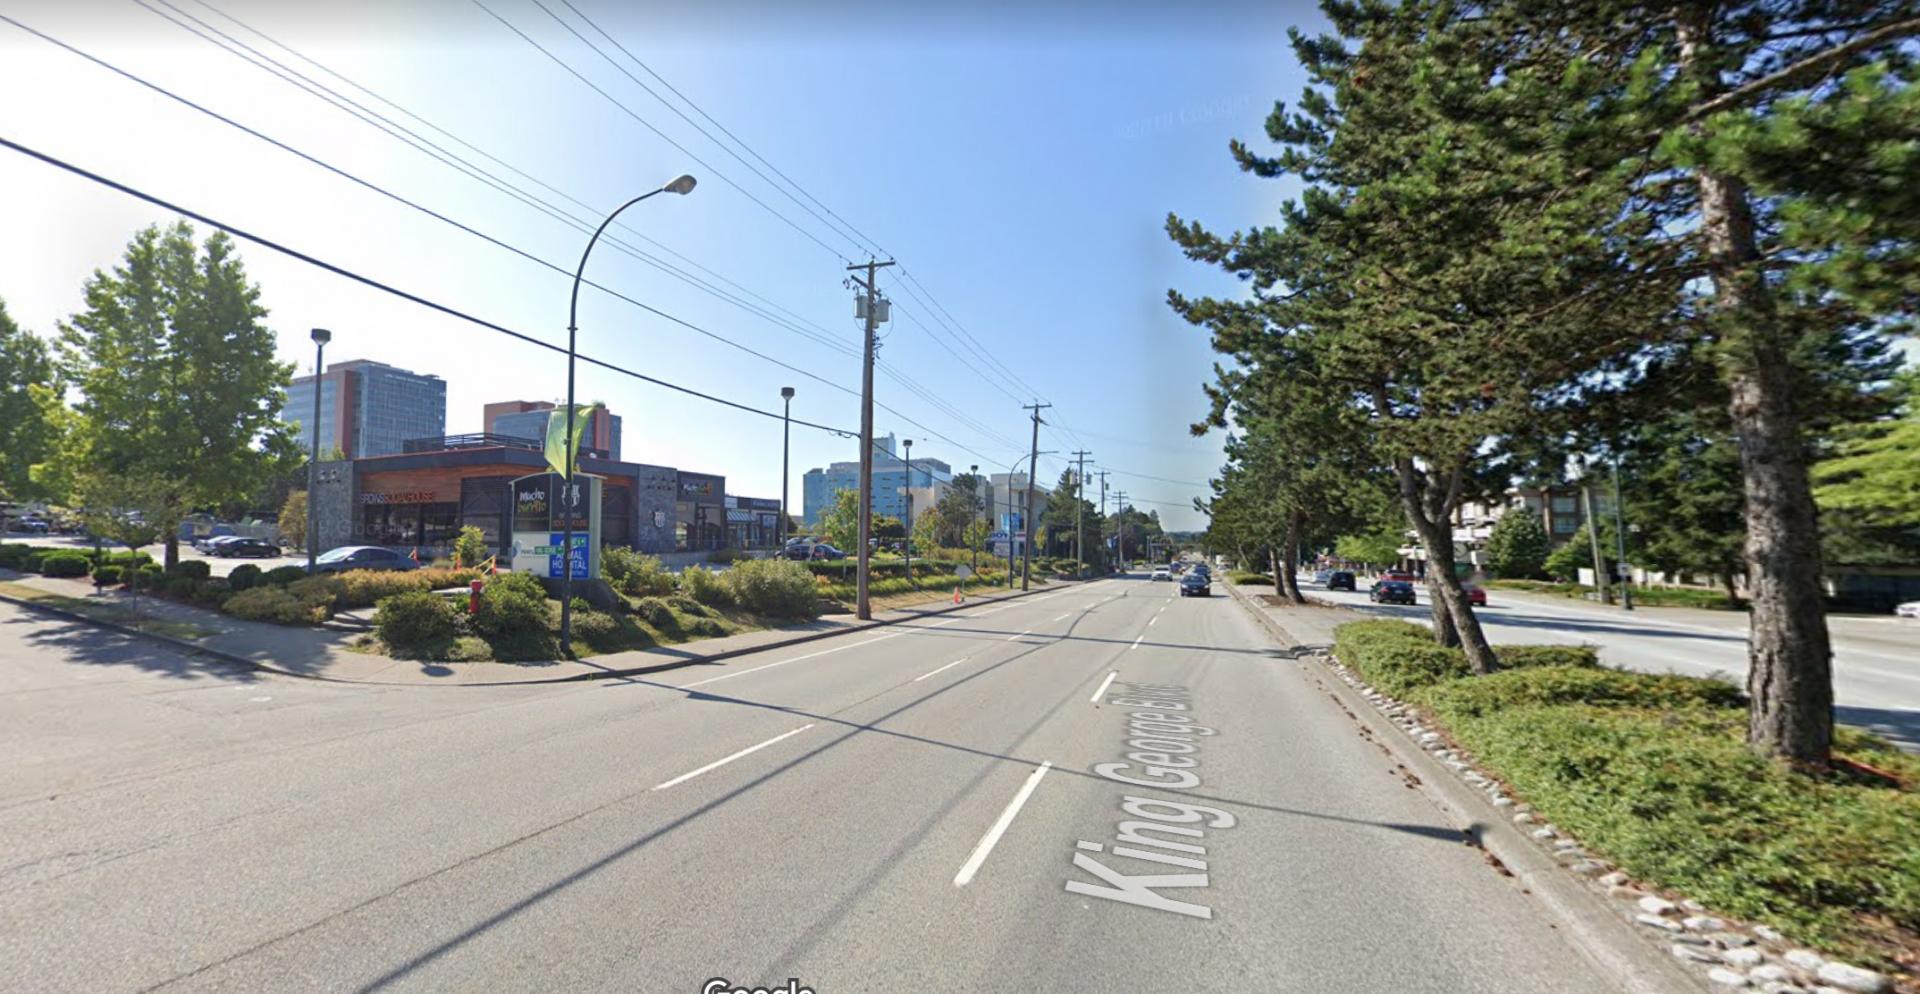 Multi-vehicle crash in Surrey closes King George Boulevard